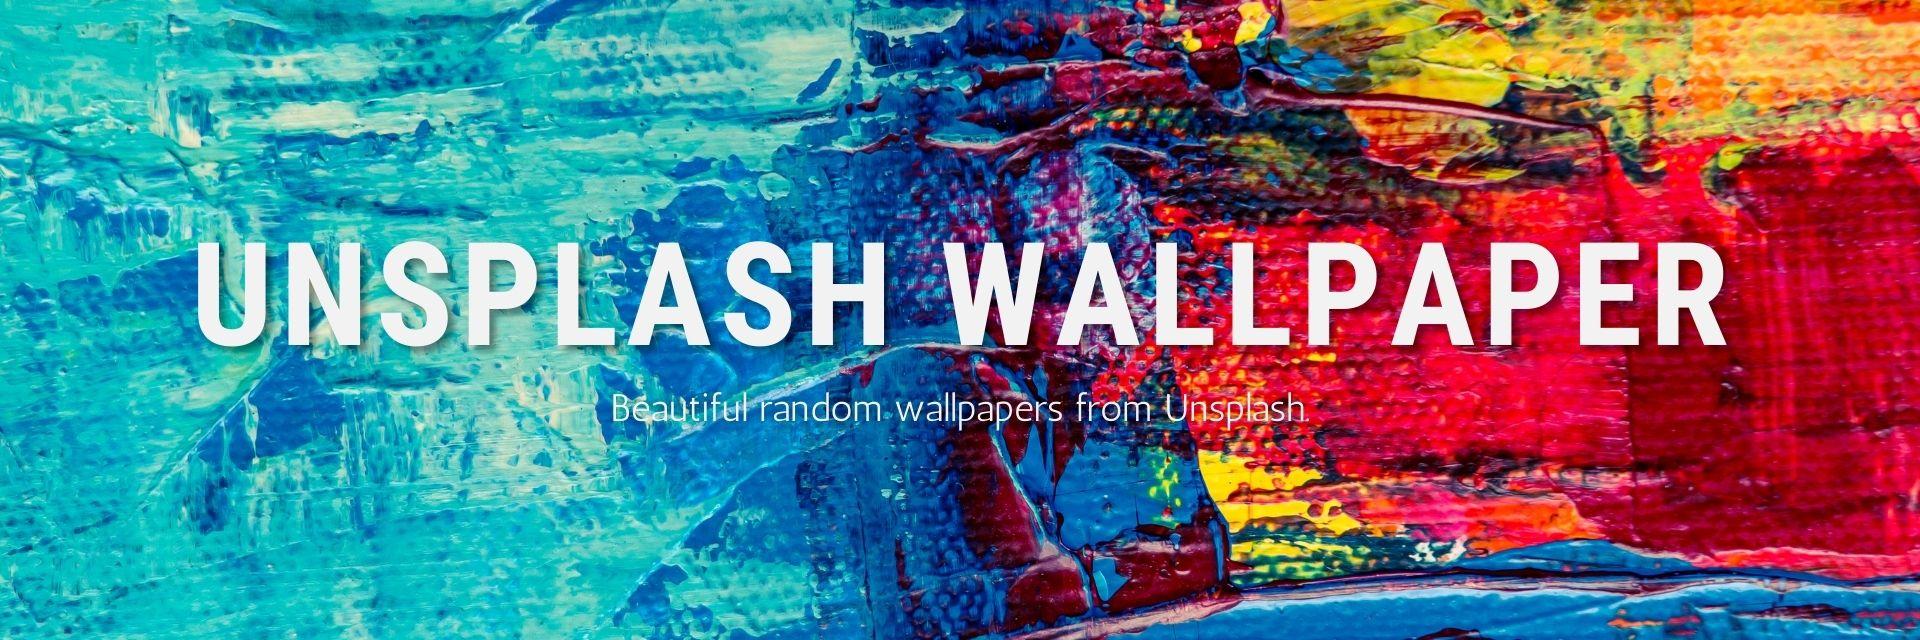 Unsplash Wallpaper banner